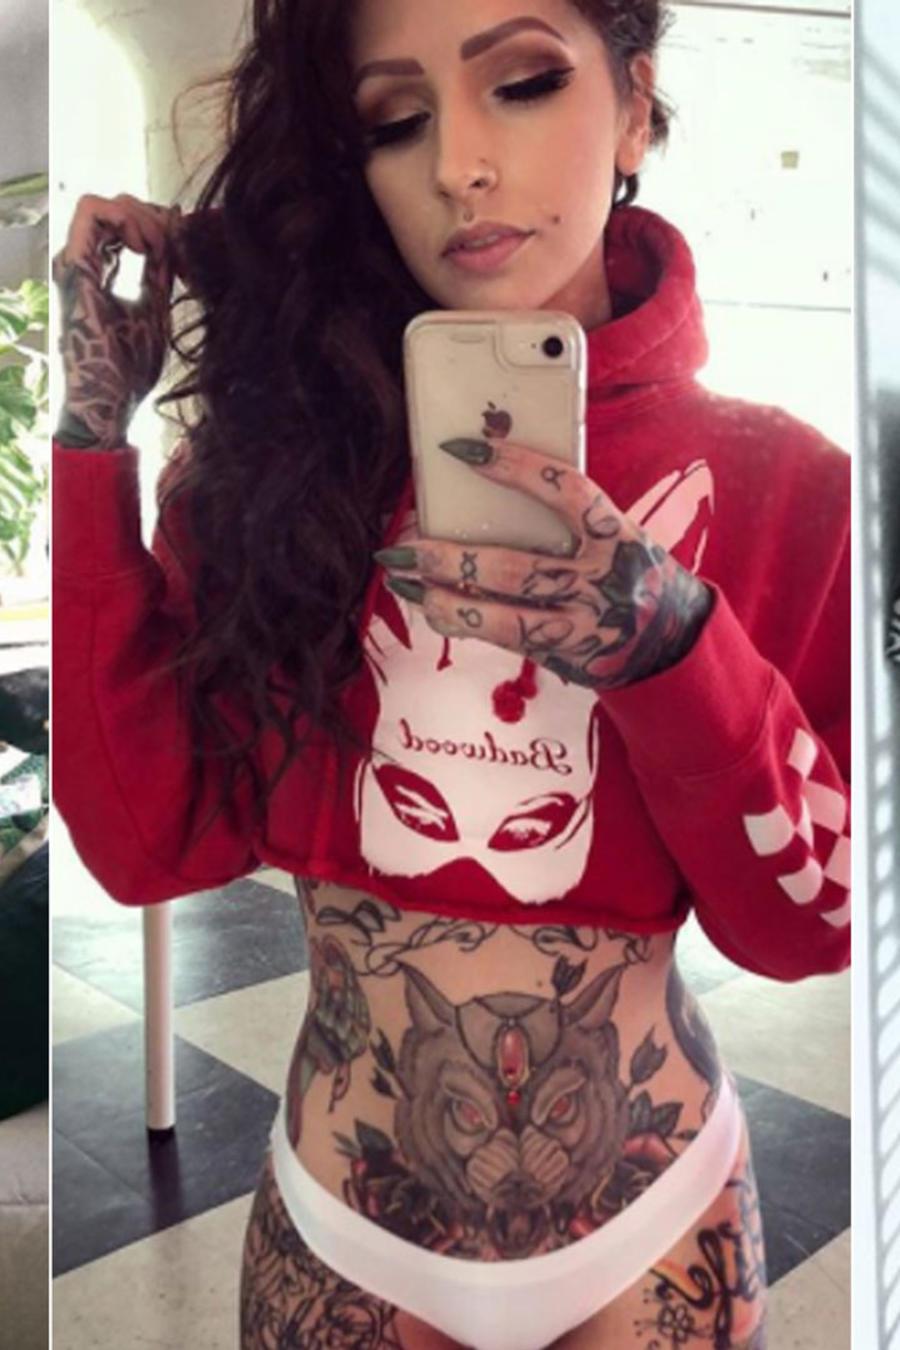 Chicas de Instagram con tatuajes